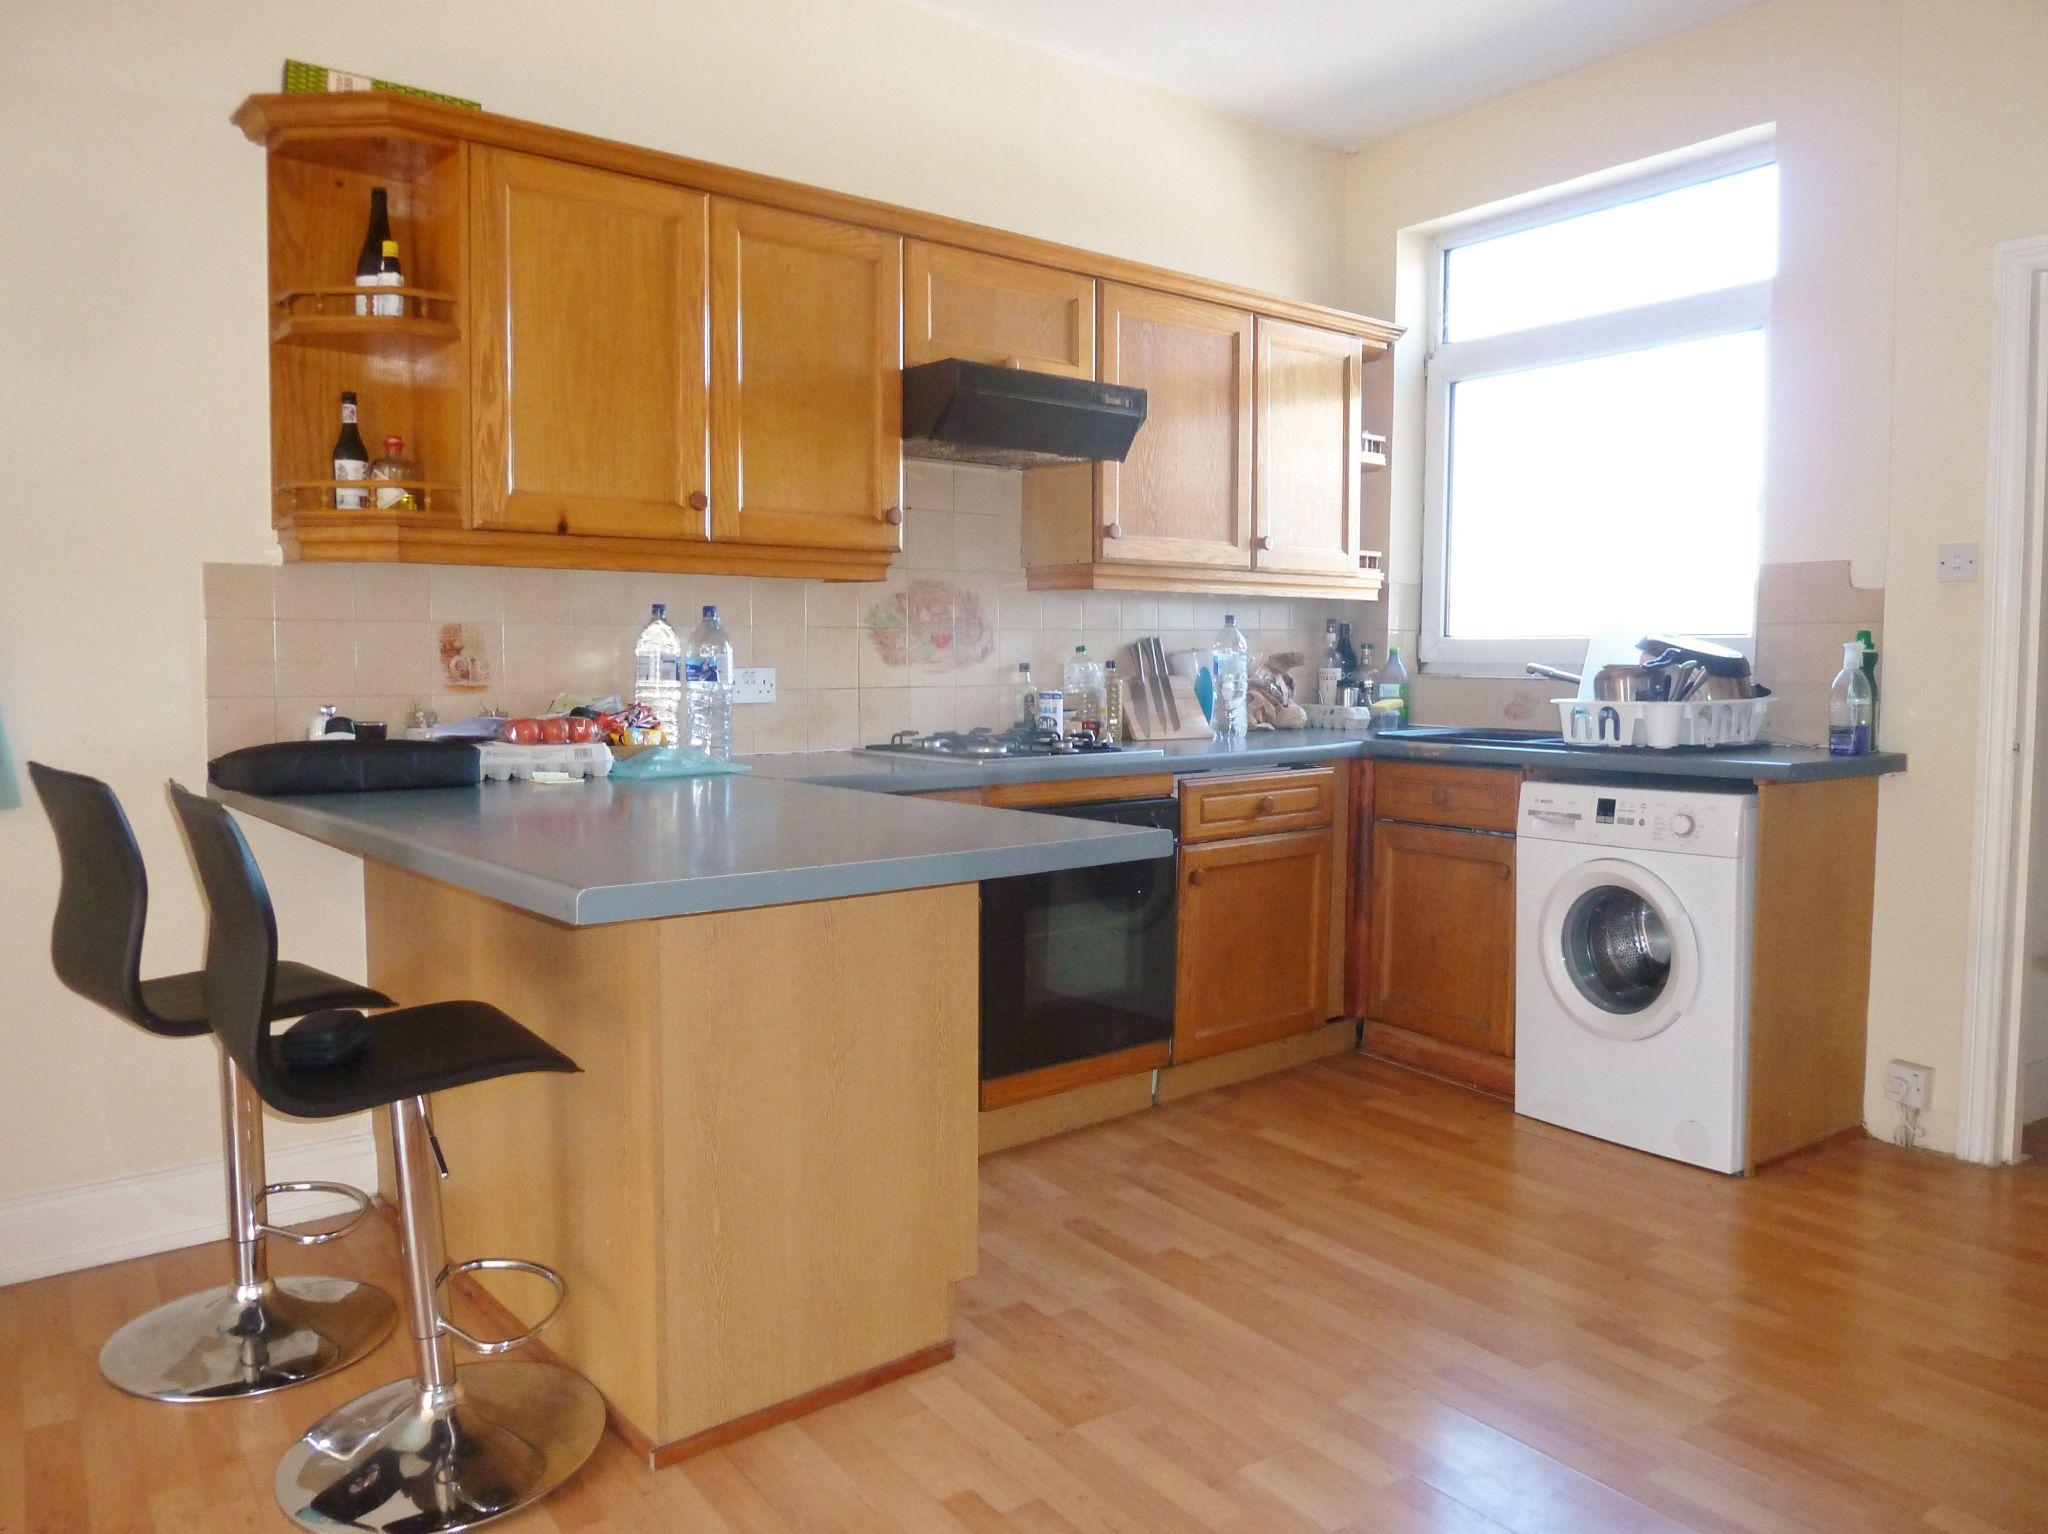 1 bedroom studio flat/apartment To Let in Willesden Green - Washing Machine